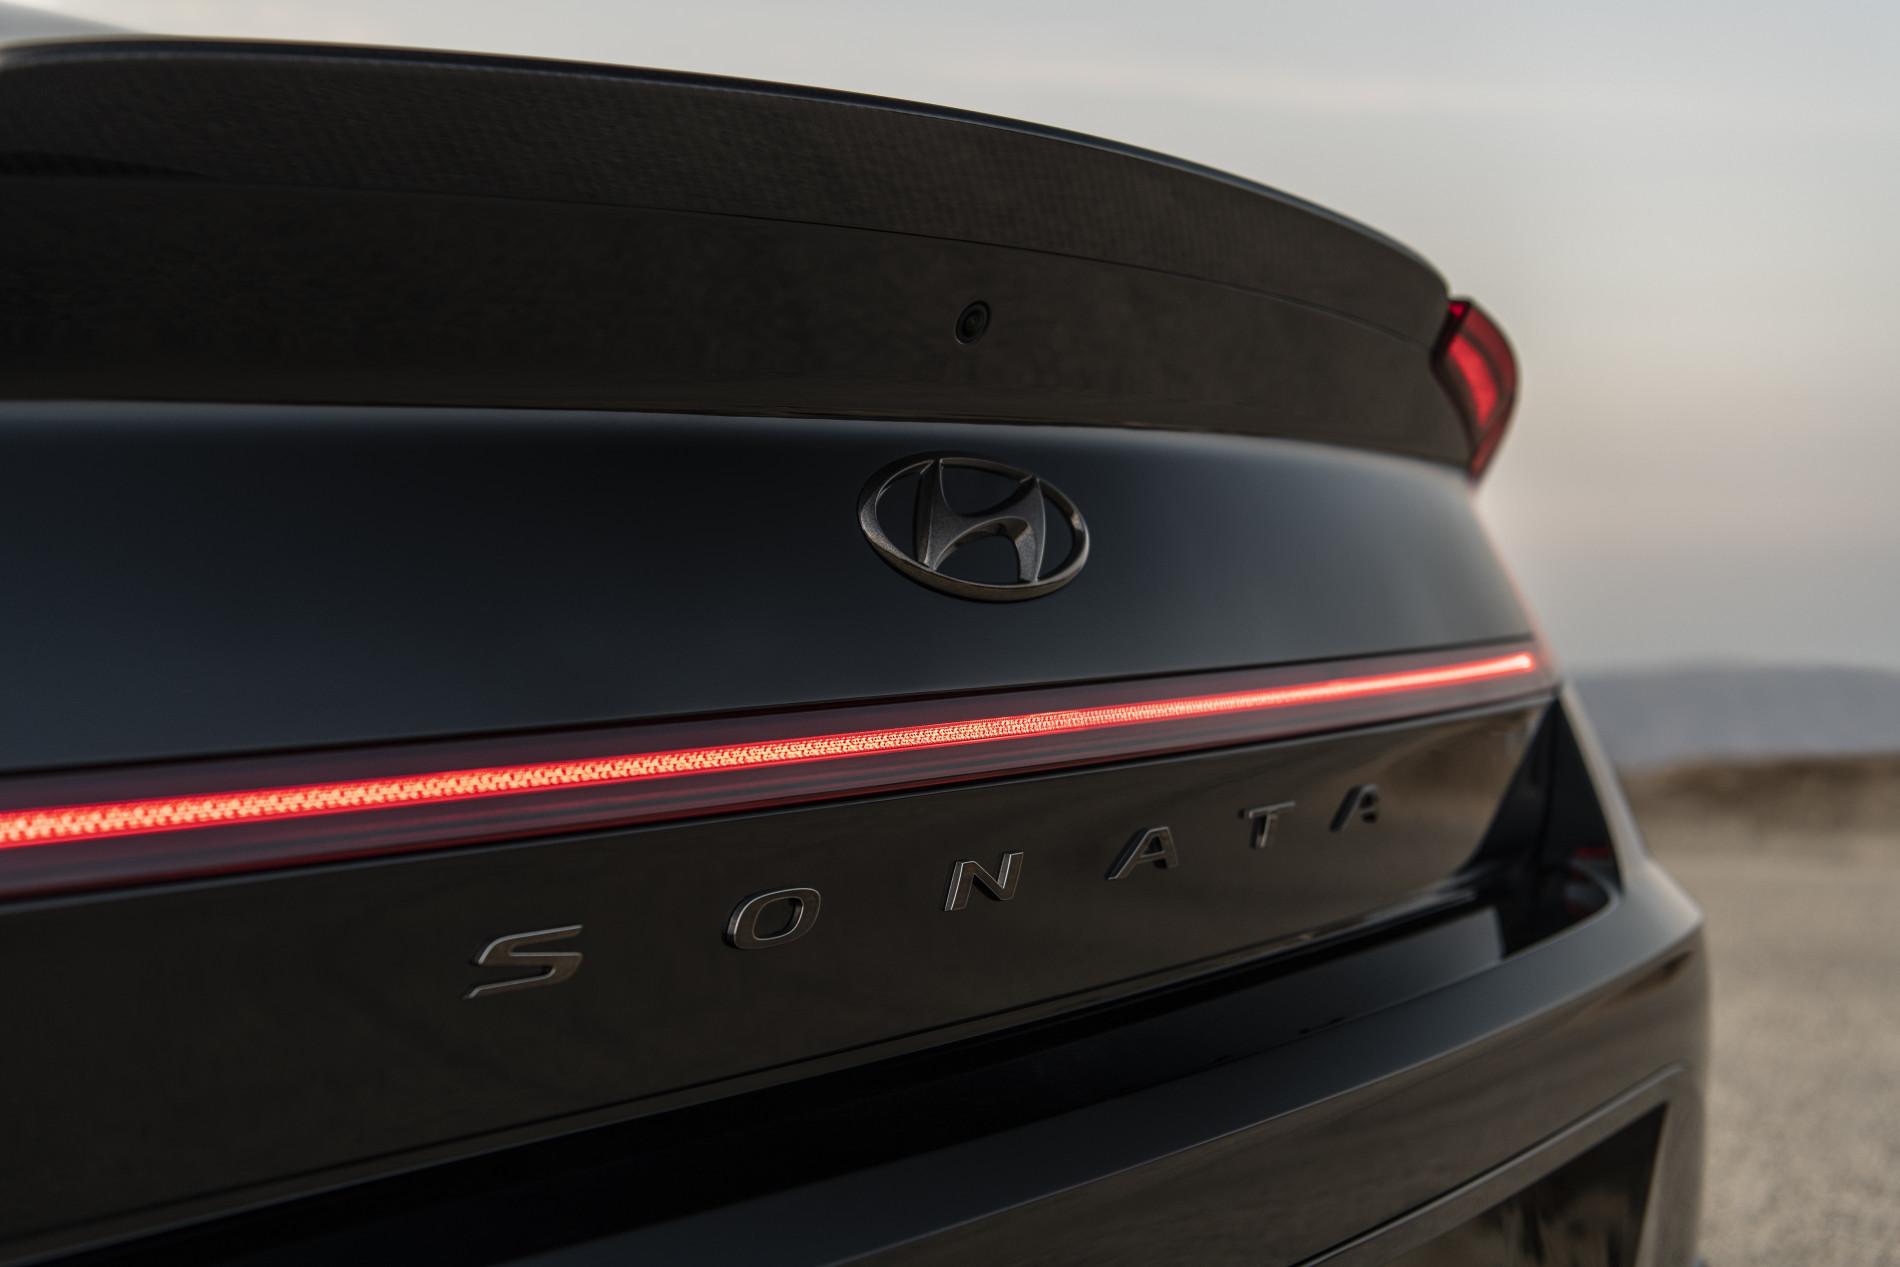 Hyundai Sonata N Line Night Edition - Hyundai Sonata N Line Night Edition